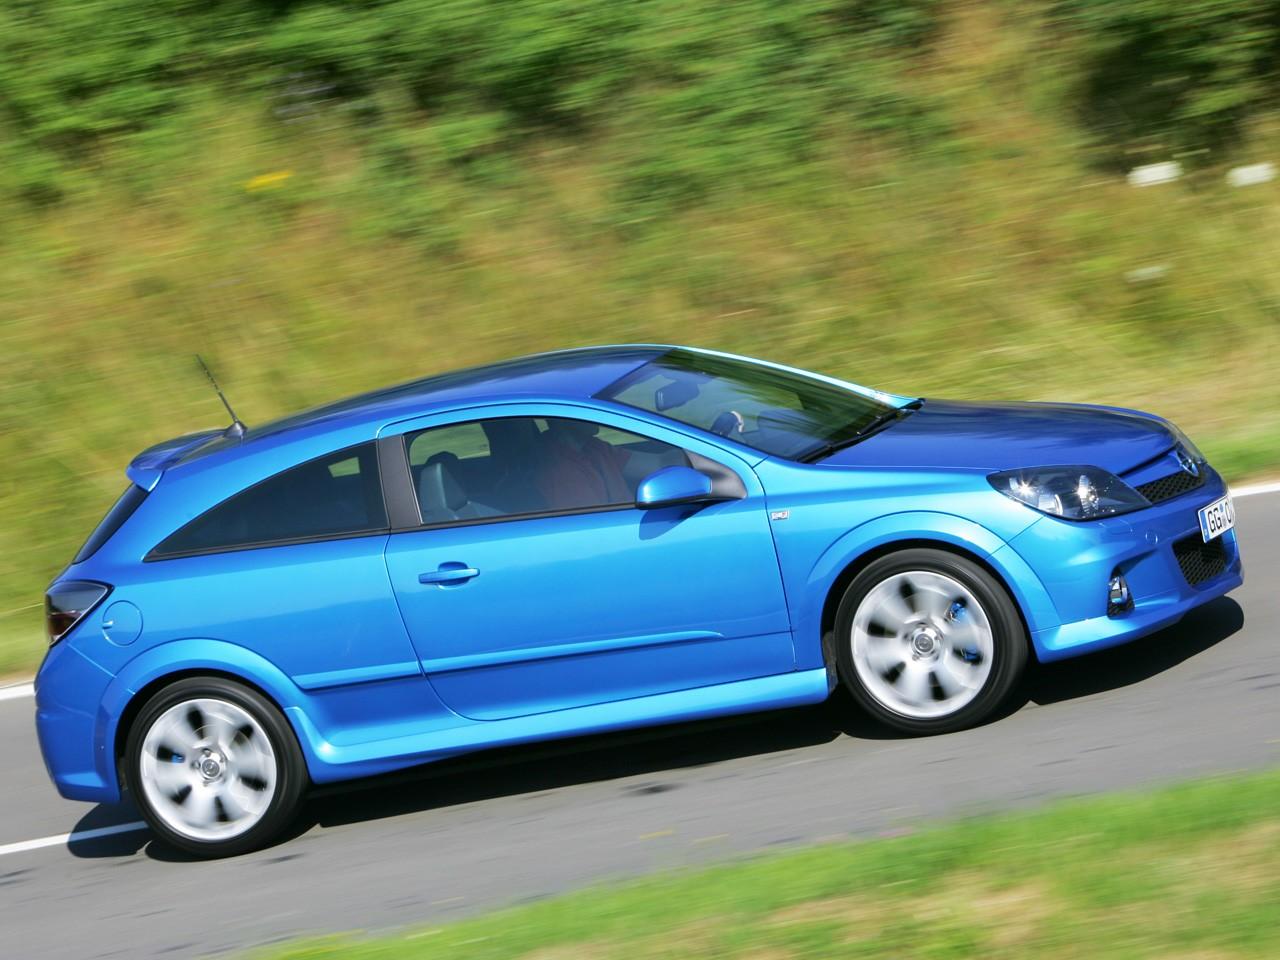 Opel Astra 3 Doors Gtc Opc Specs 2005 2006 2007 2008 2009 Autoevolution